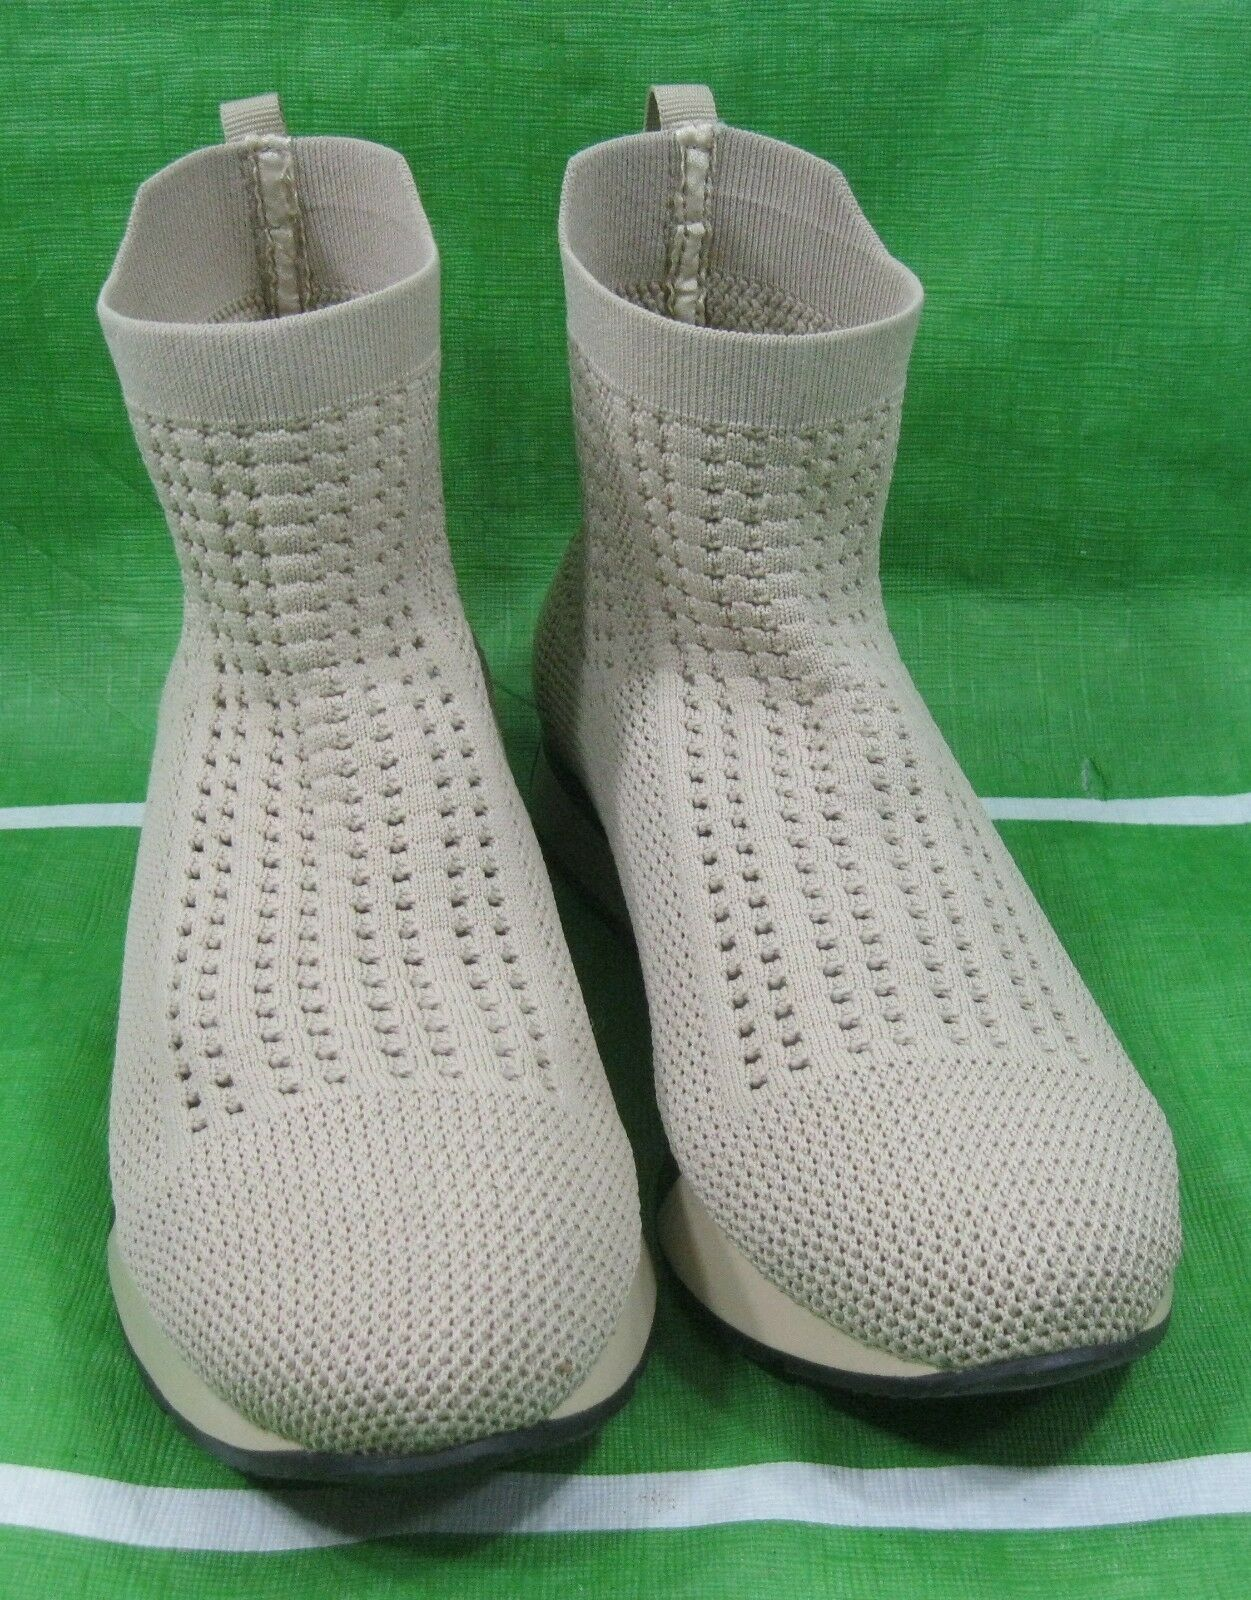 Neu Scheich Skitone Damen Iva Atmungsaktiv Sneaker Weich Atmungsaktiv Iva Flexibel Sexy Größe 6 d55748